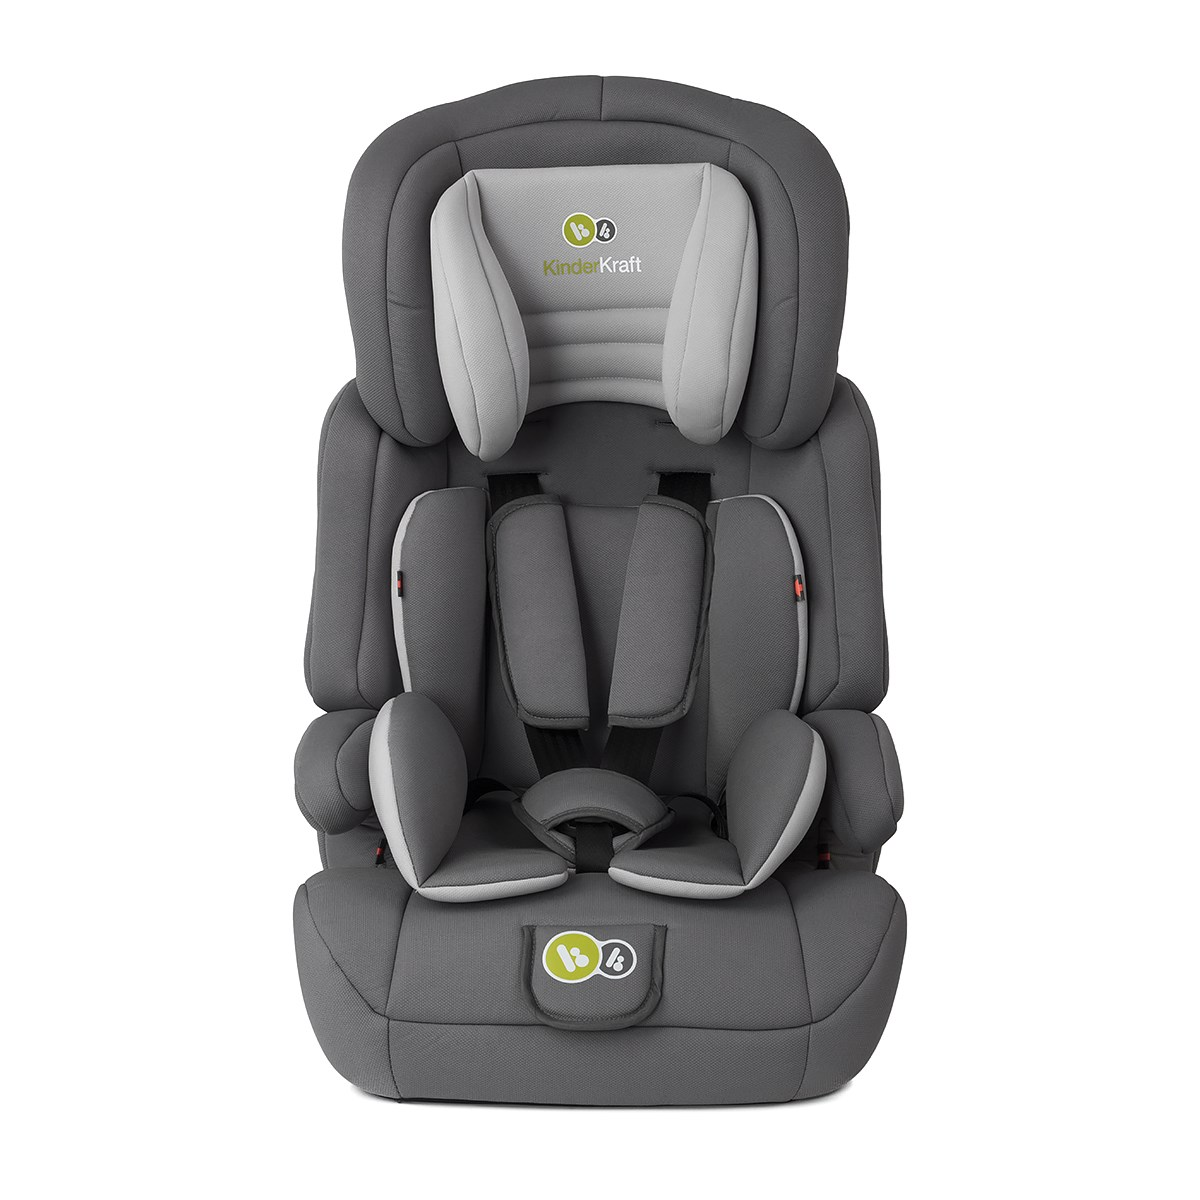 autokindersitz autositz kindersitz kinderkraft comfort up grau 9 36 kg gruppe1 3 ebay. Black Bedroom Furniture Sets. Home Design Ideas